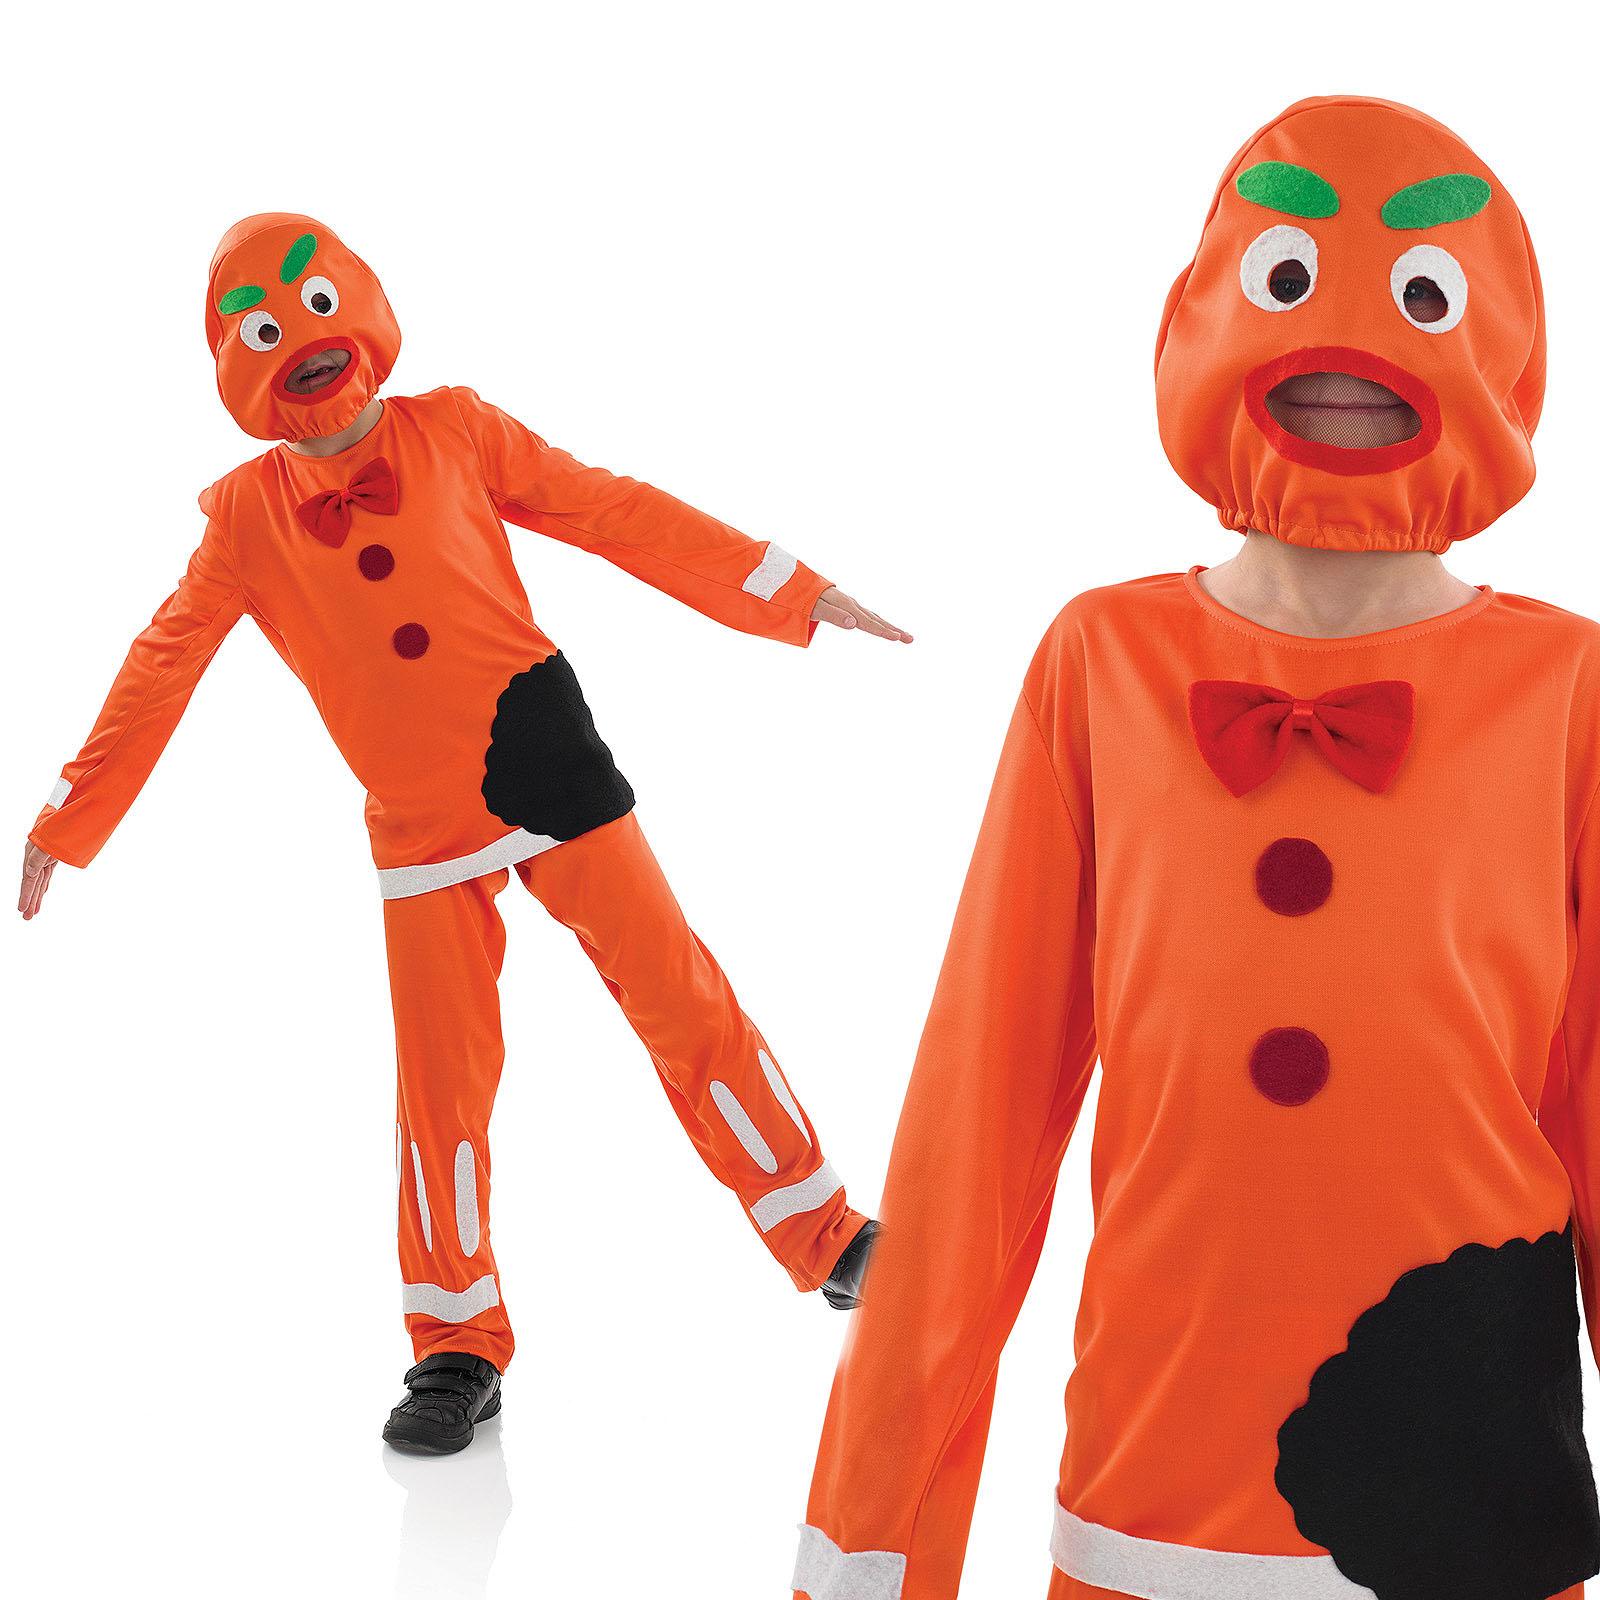 Kids-Gingerbread-Man-Halloween-Costume-Childrens-Boys-Book-  sc 1 st  eBay & Kids Gingerbread Man Halloween Costume Childrens Boys Book Week ...